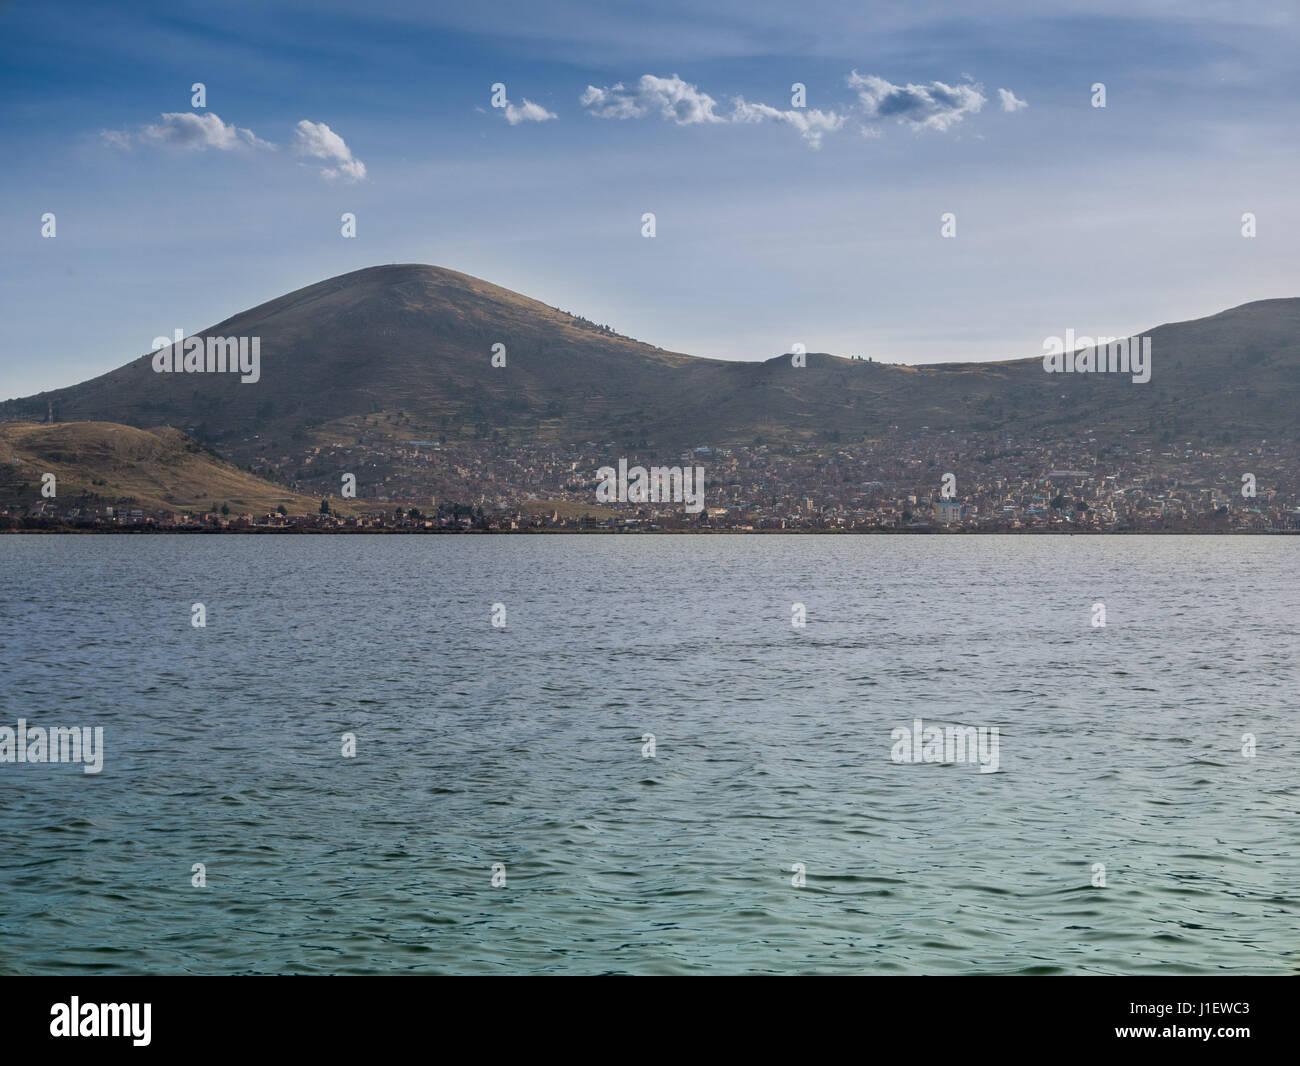 Puno City on the shore of Lake Titikaka Peru South America - Stock Image